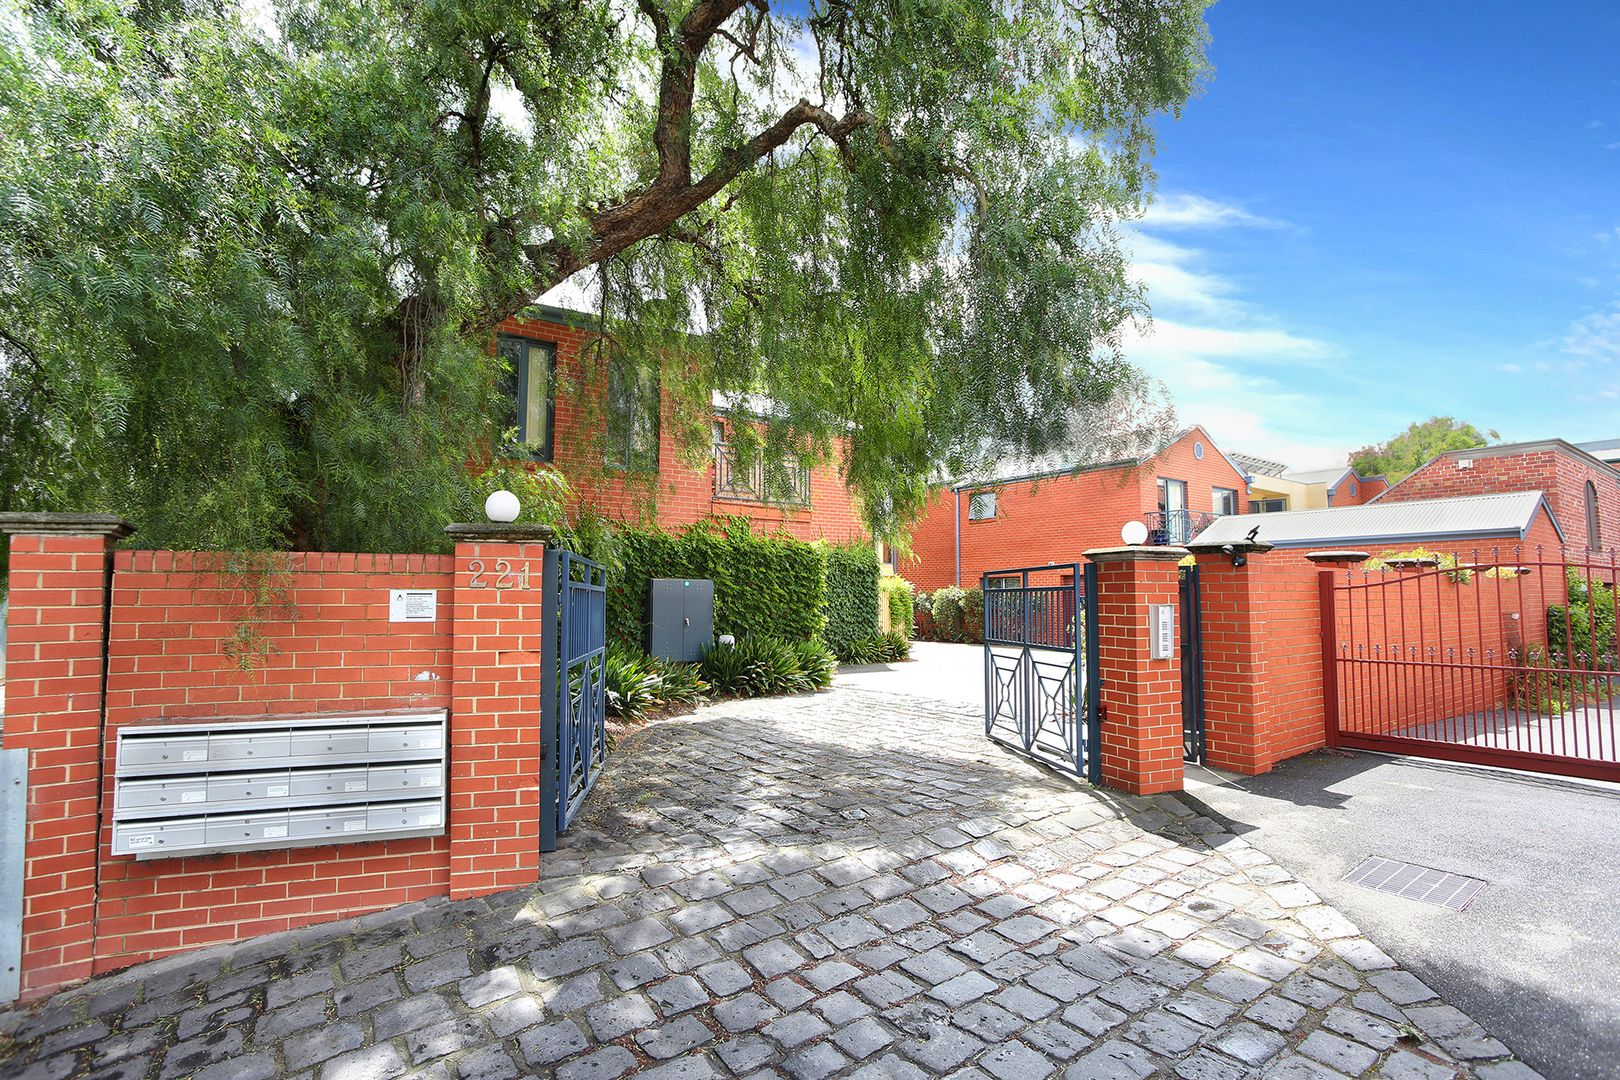 5/221 McKean Street, Fitzroy North VIC 3068, Image 0